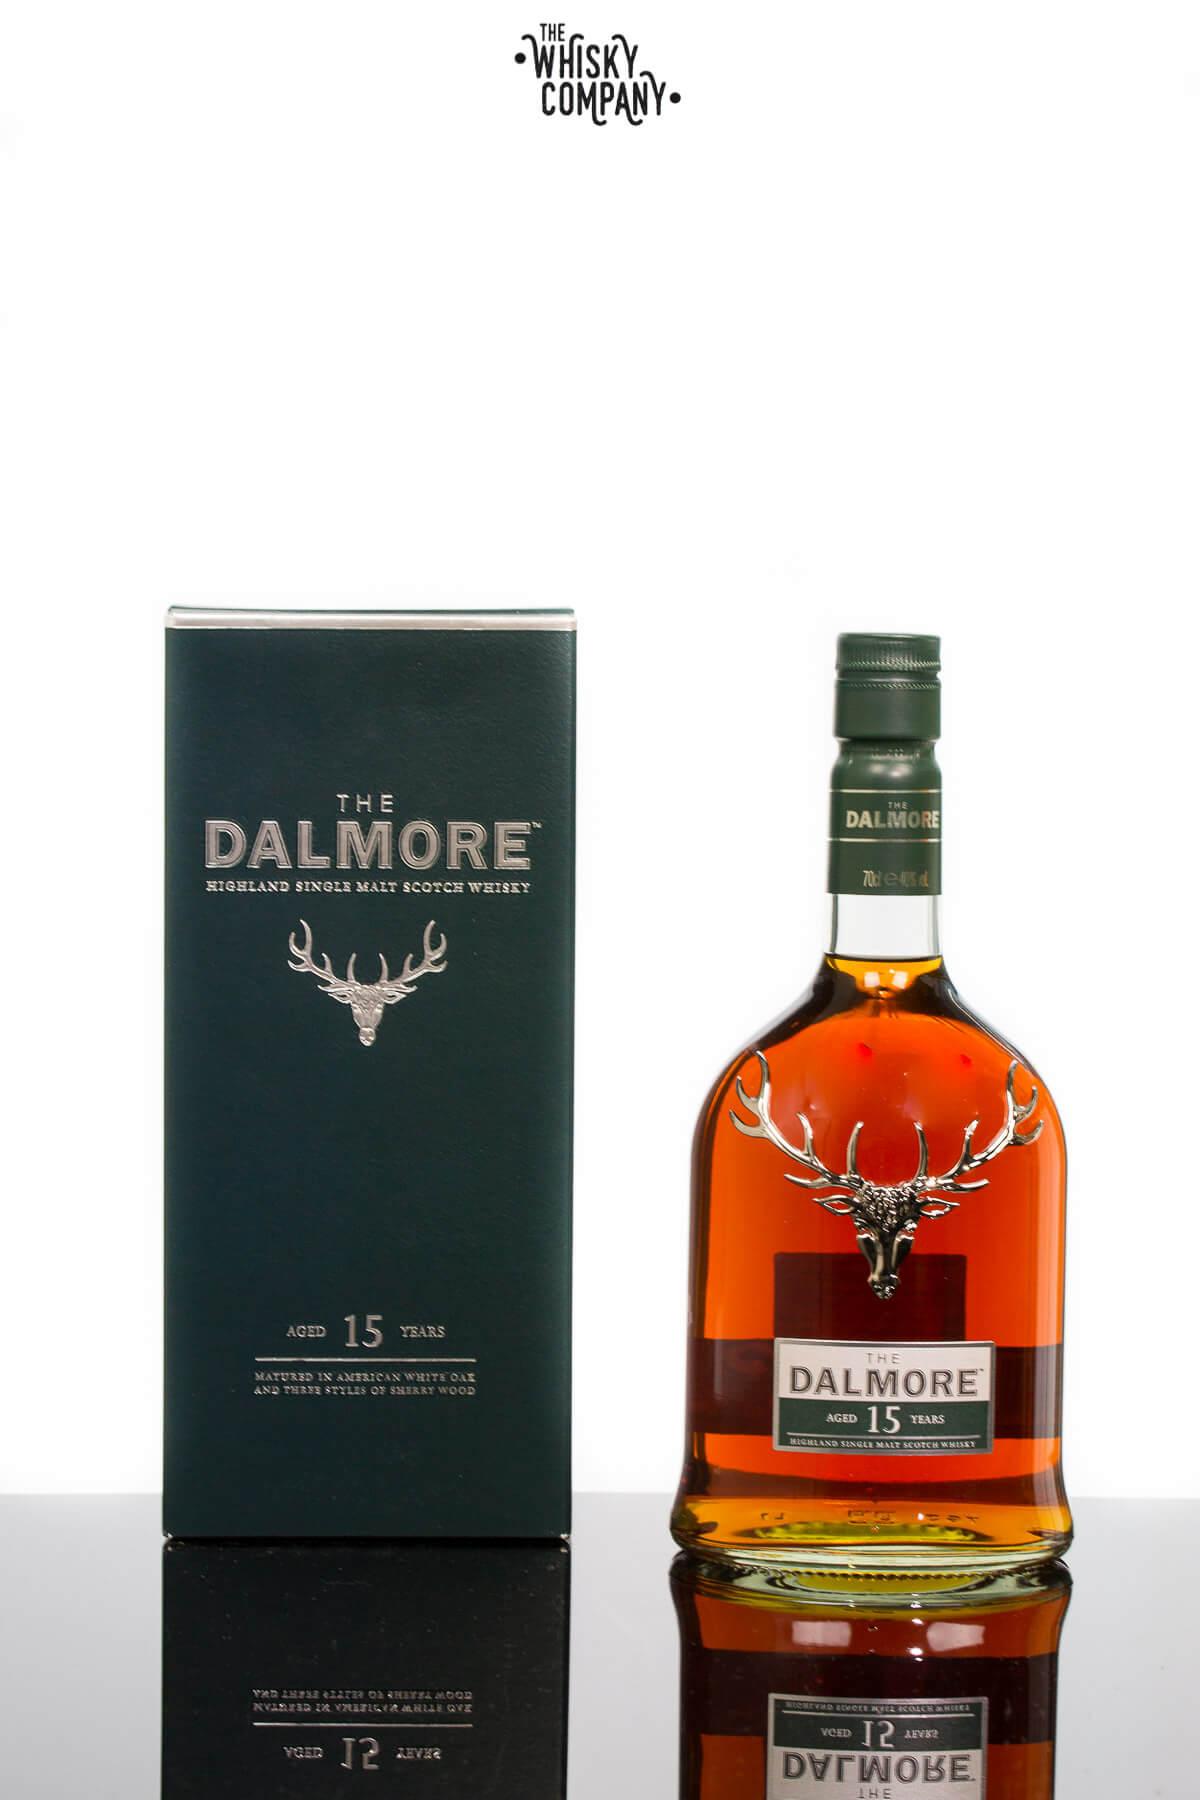 The Dalmore Aged 15 Years Highland Single Malt Scotch Whisky